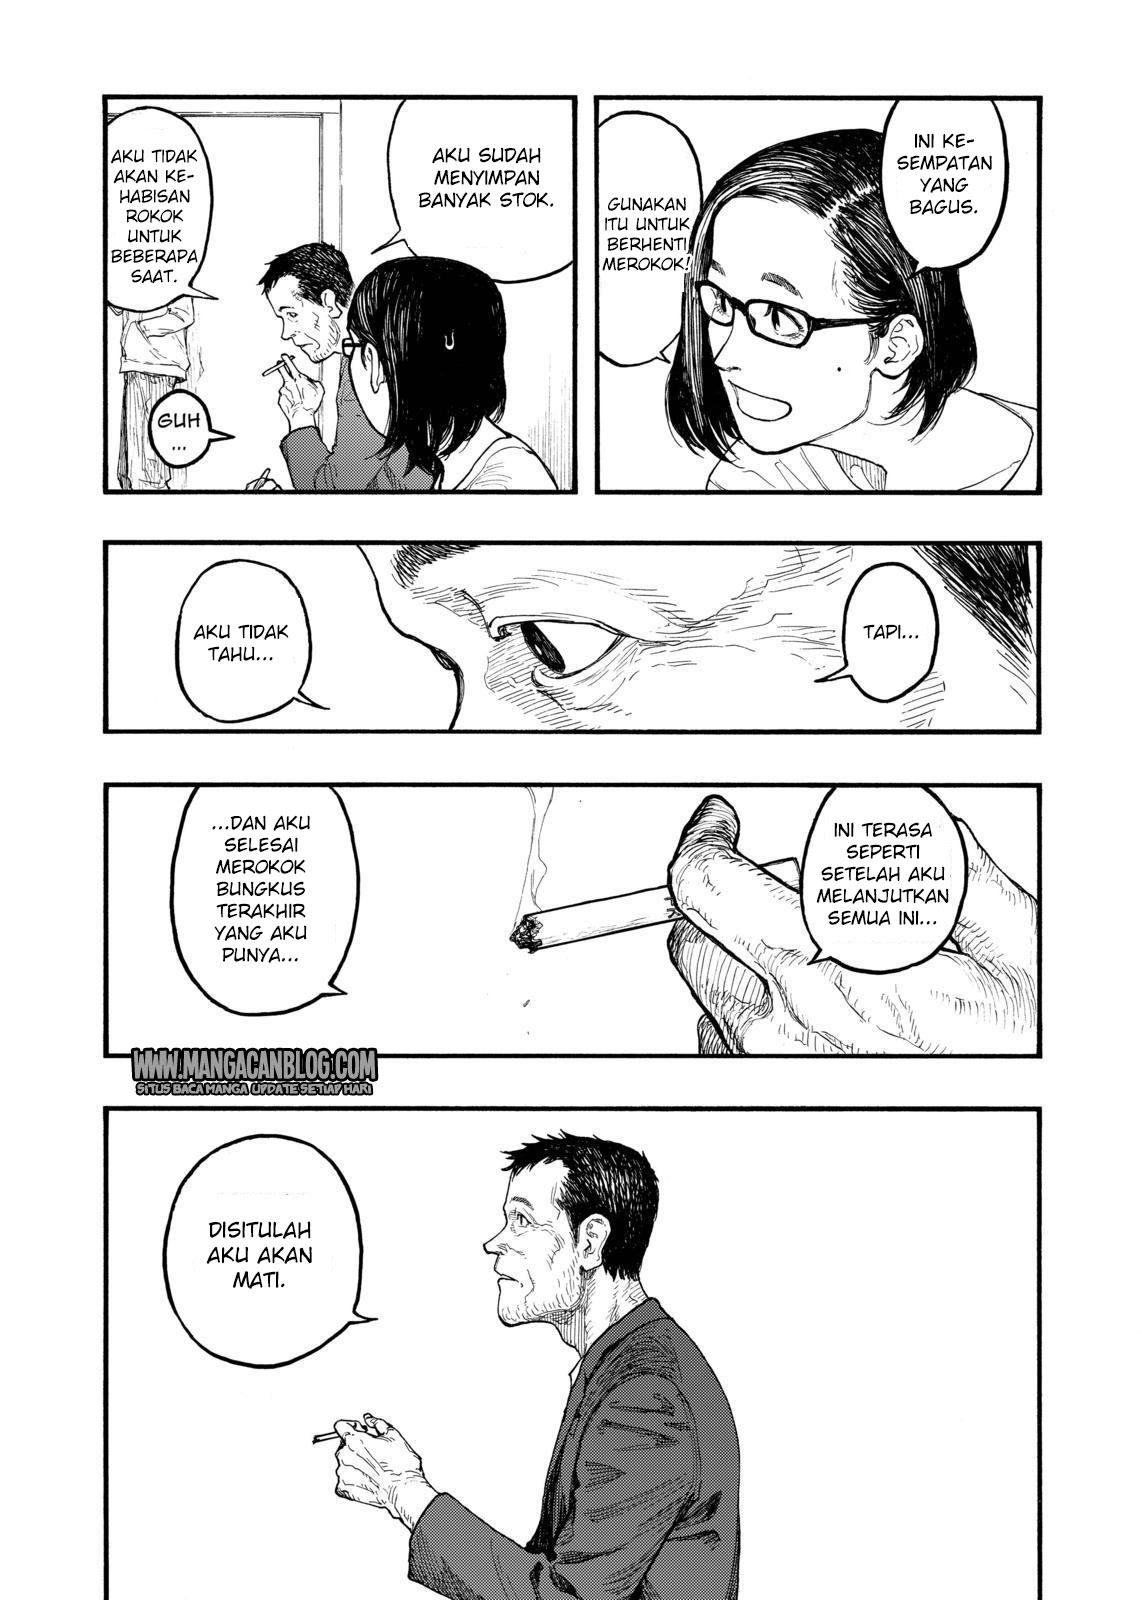 Dilarang COPAS - situs resmi www.mangacanblog.com - Komik ajin 046 - selamat pagi, sampai jumpa besok 47 Indonesia ajin 046 - selamat pagi, sampai jumpa besok Terbaru 17|Baca Manga Komik Indonesia|Mangacan